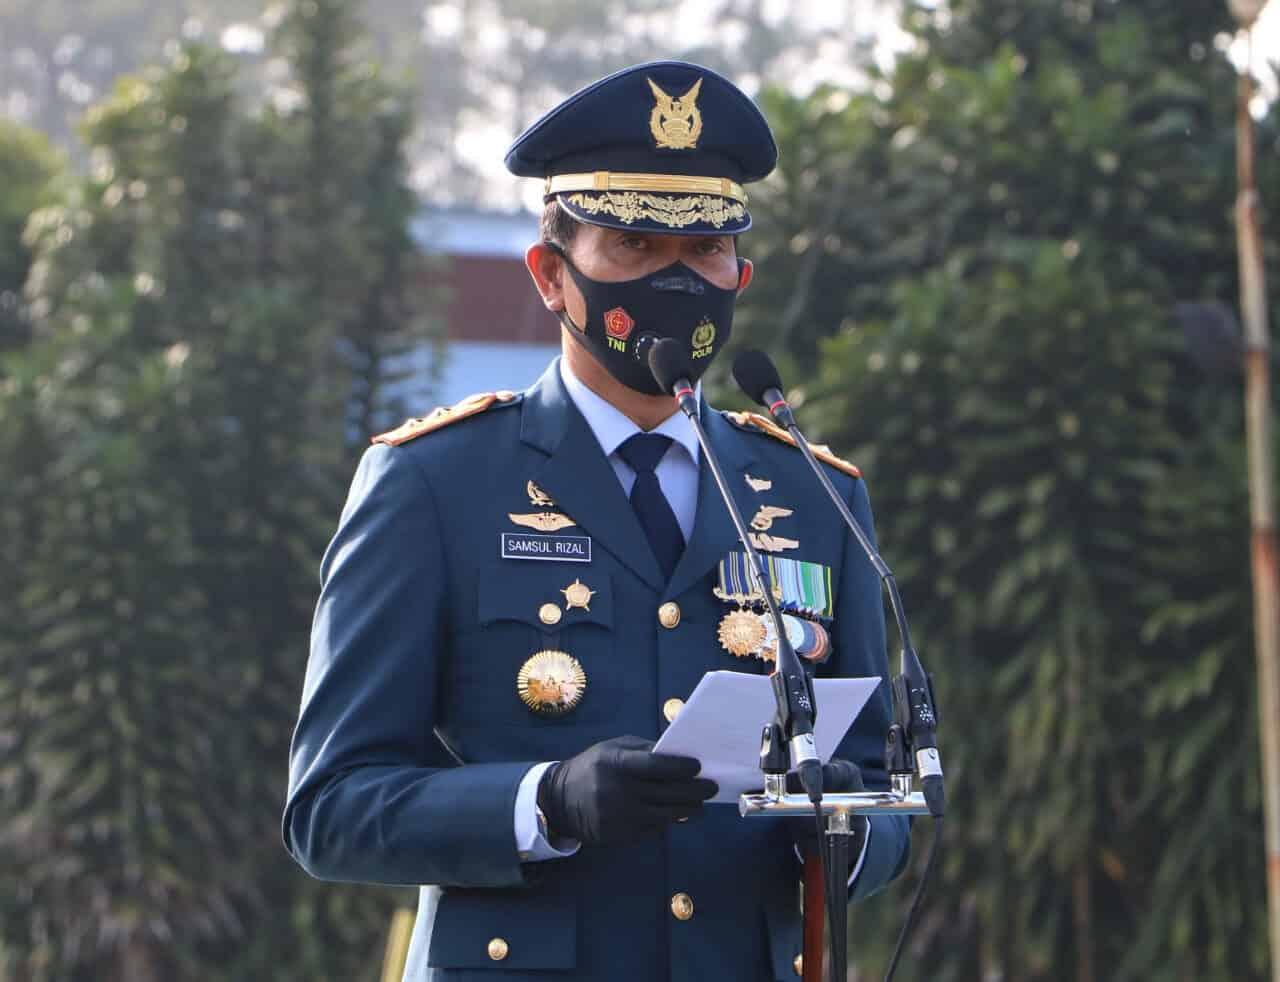 Peringatan Ke-75 Hari TNI Angkatan Udara Wujudkan TNI Angkatan Udara Yang Disegani Di Kawasan